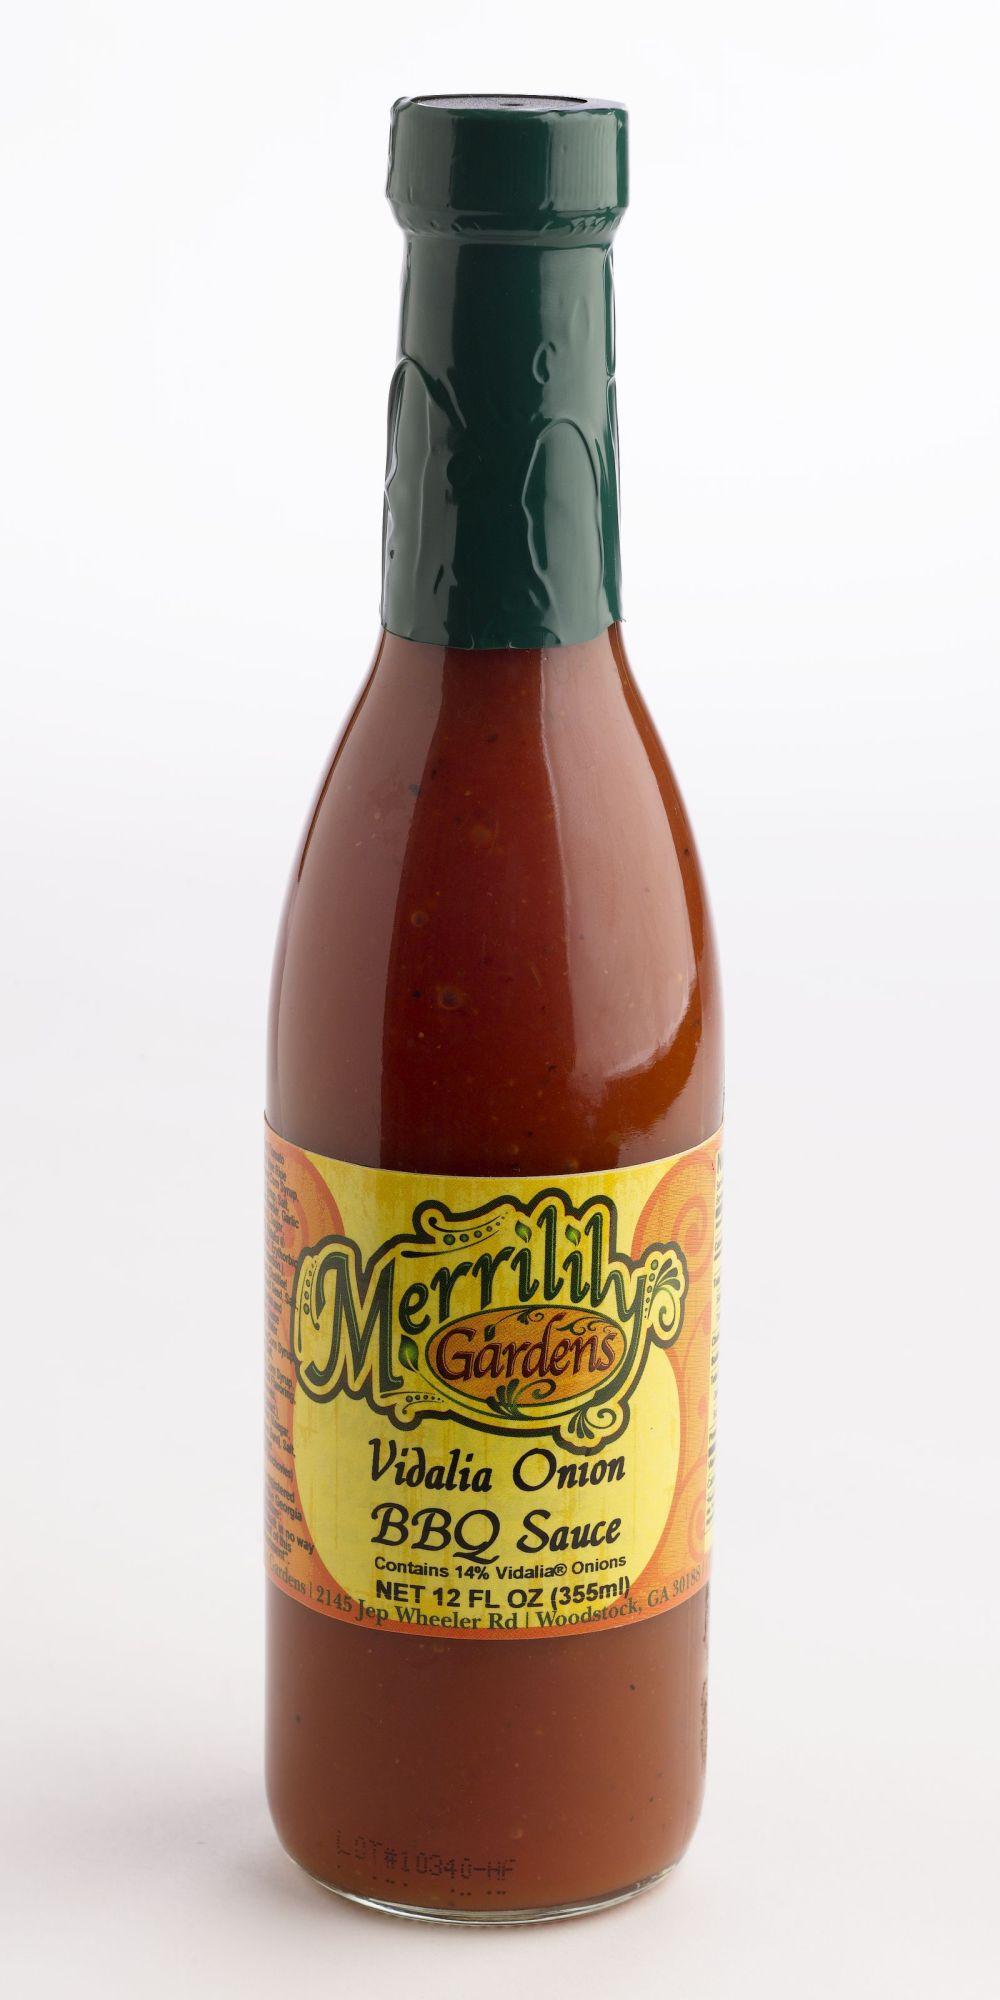 Vidalia Onion BBQ Sauce